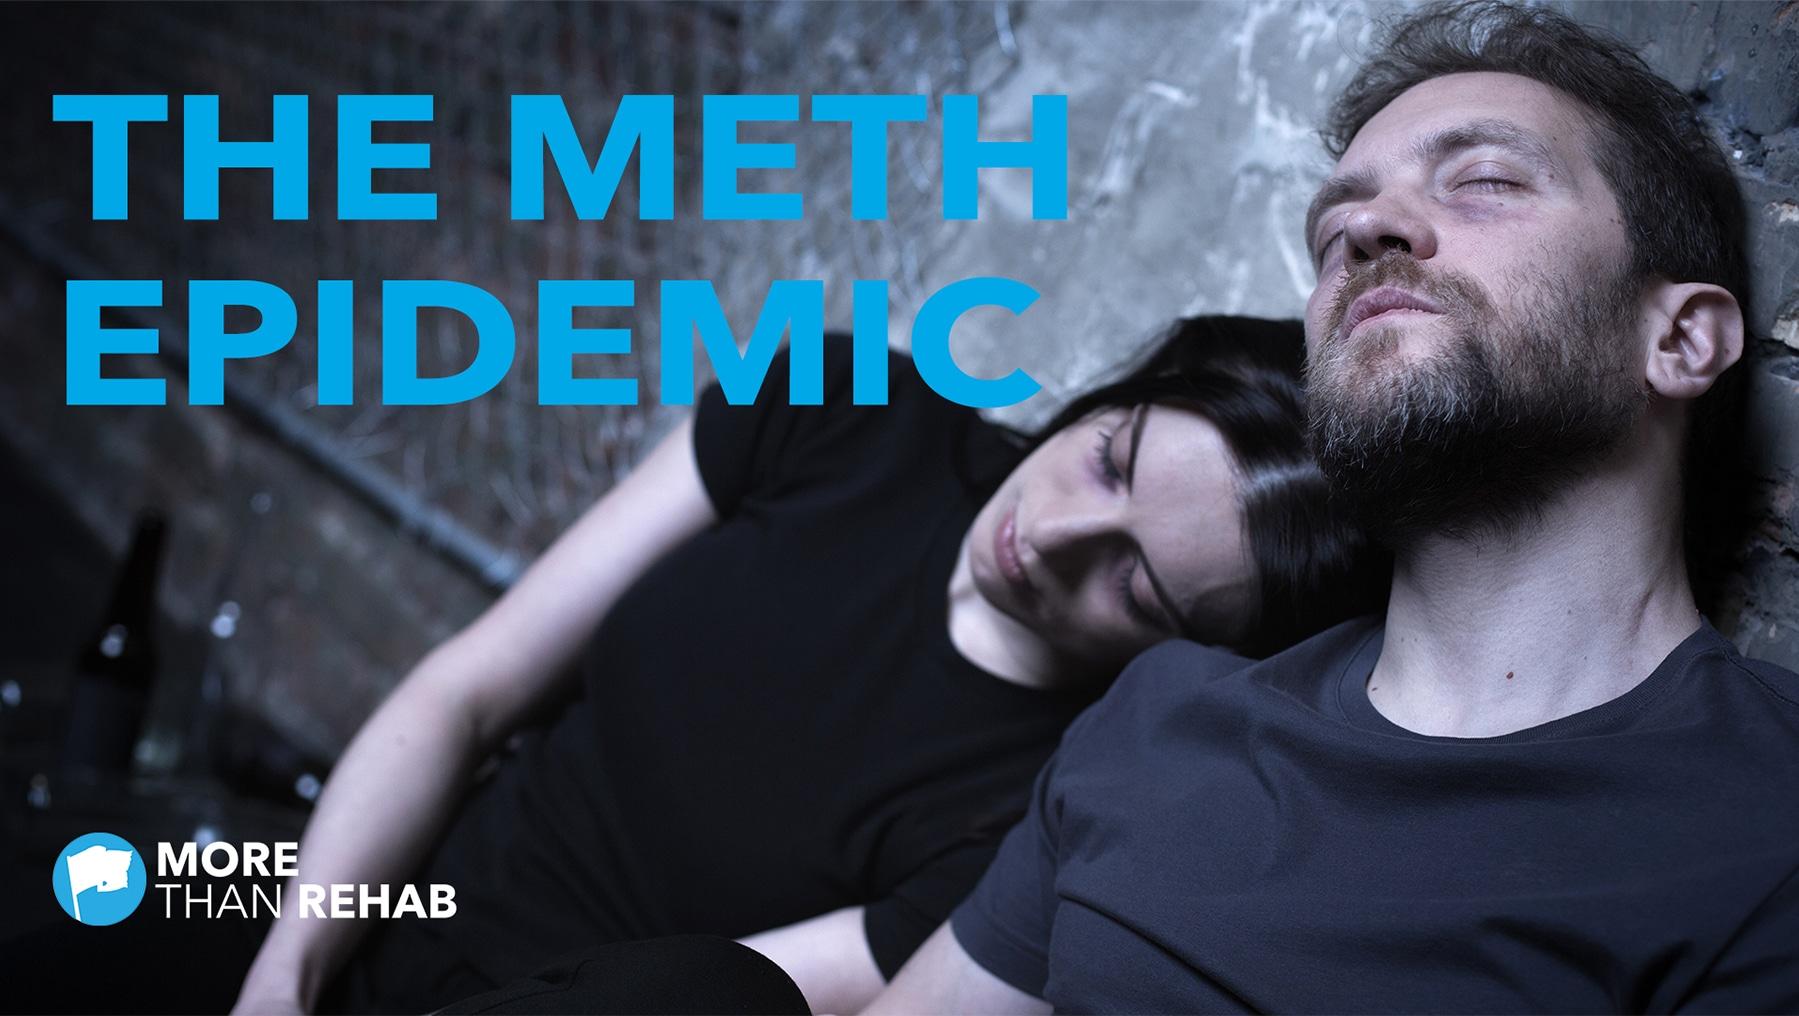 crystal-meth-epidemic-in-Texas-evidence-based-drug-rehabilitation-rehab-addiction-treatment-methamphetamine